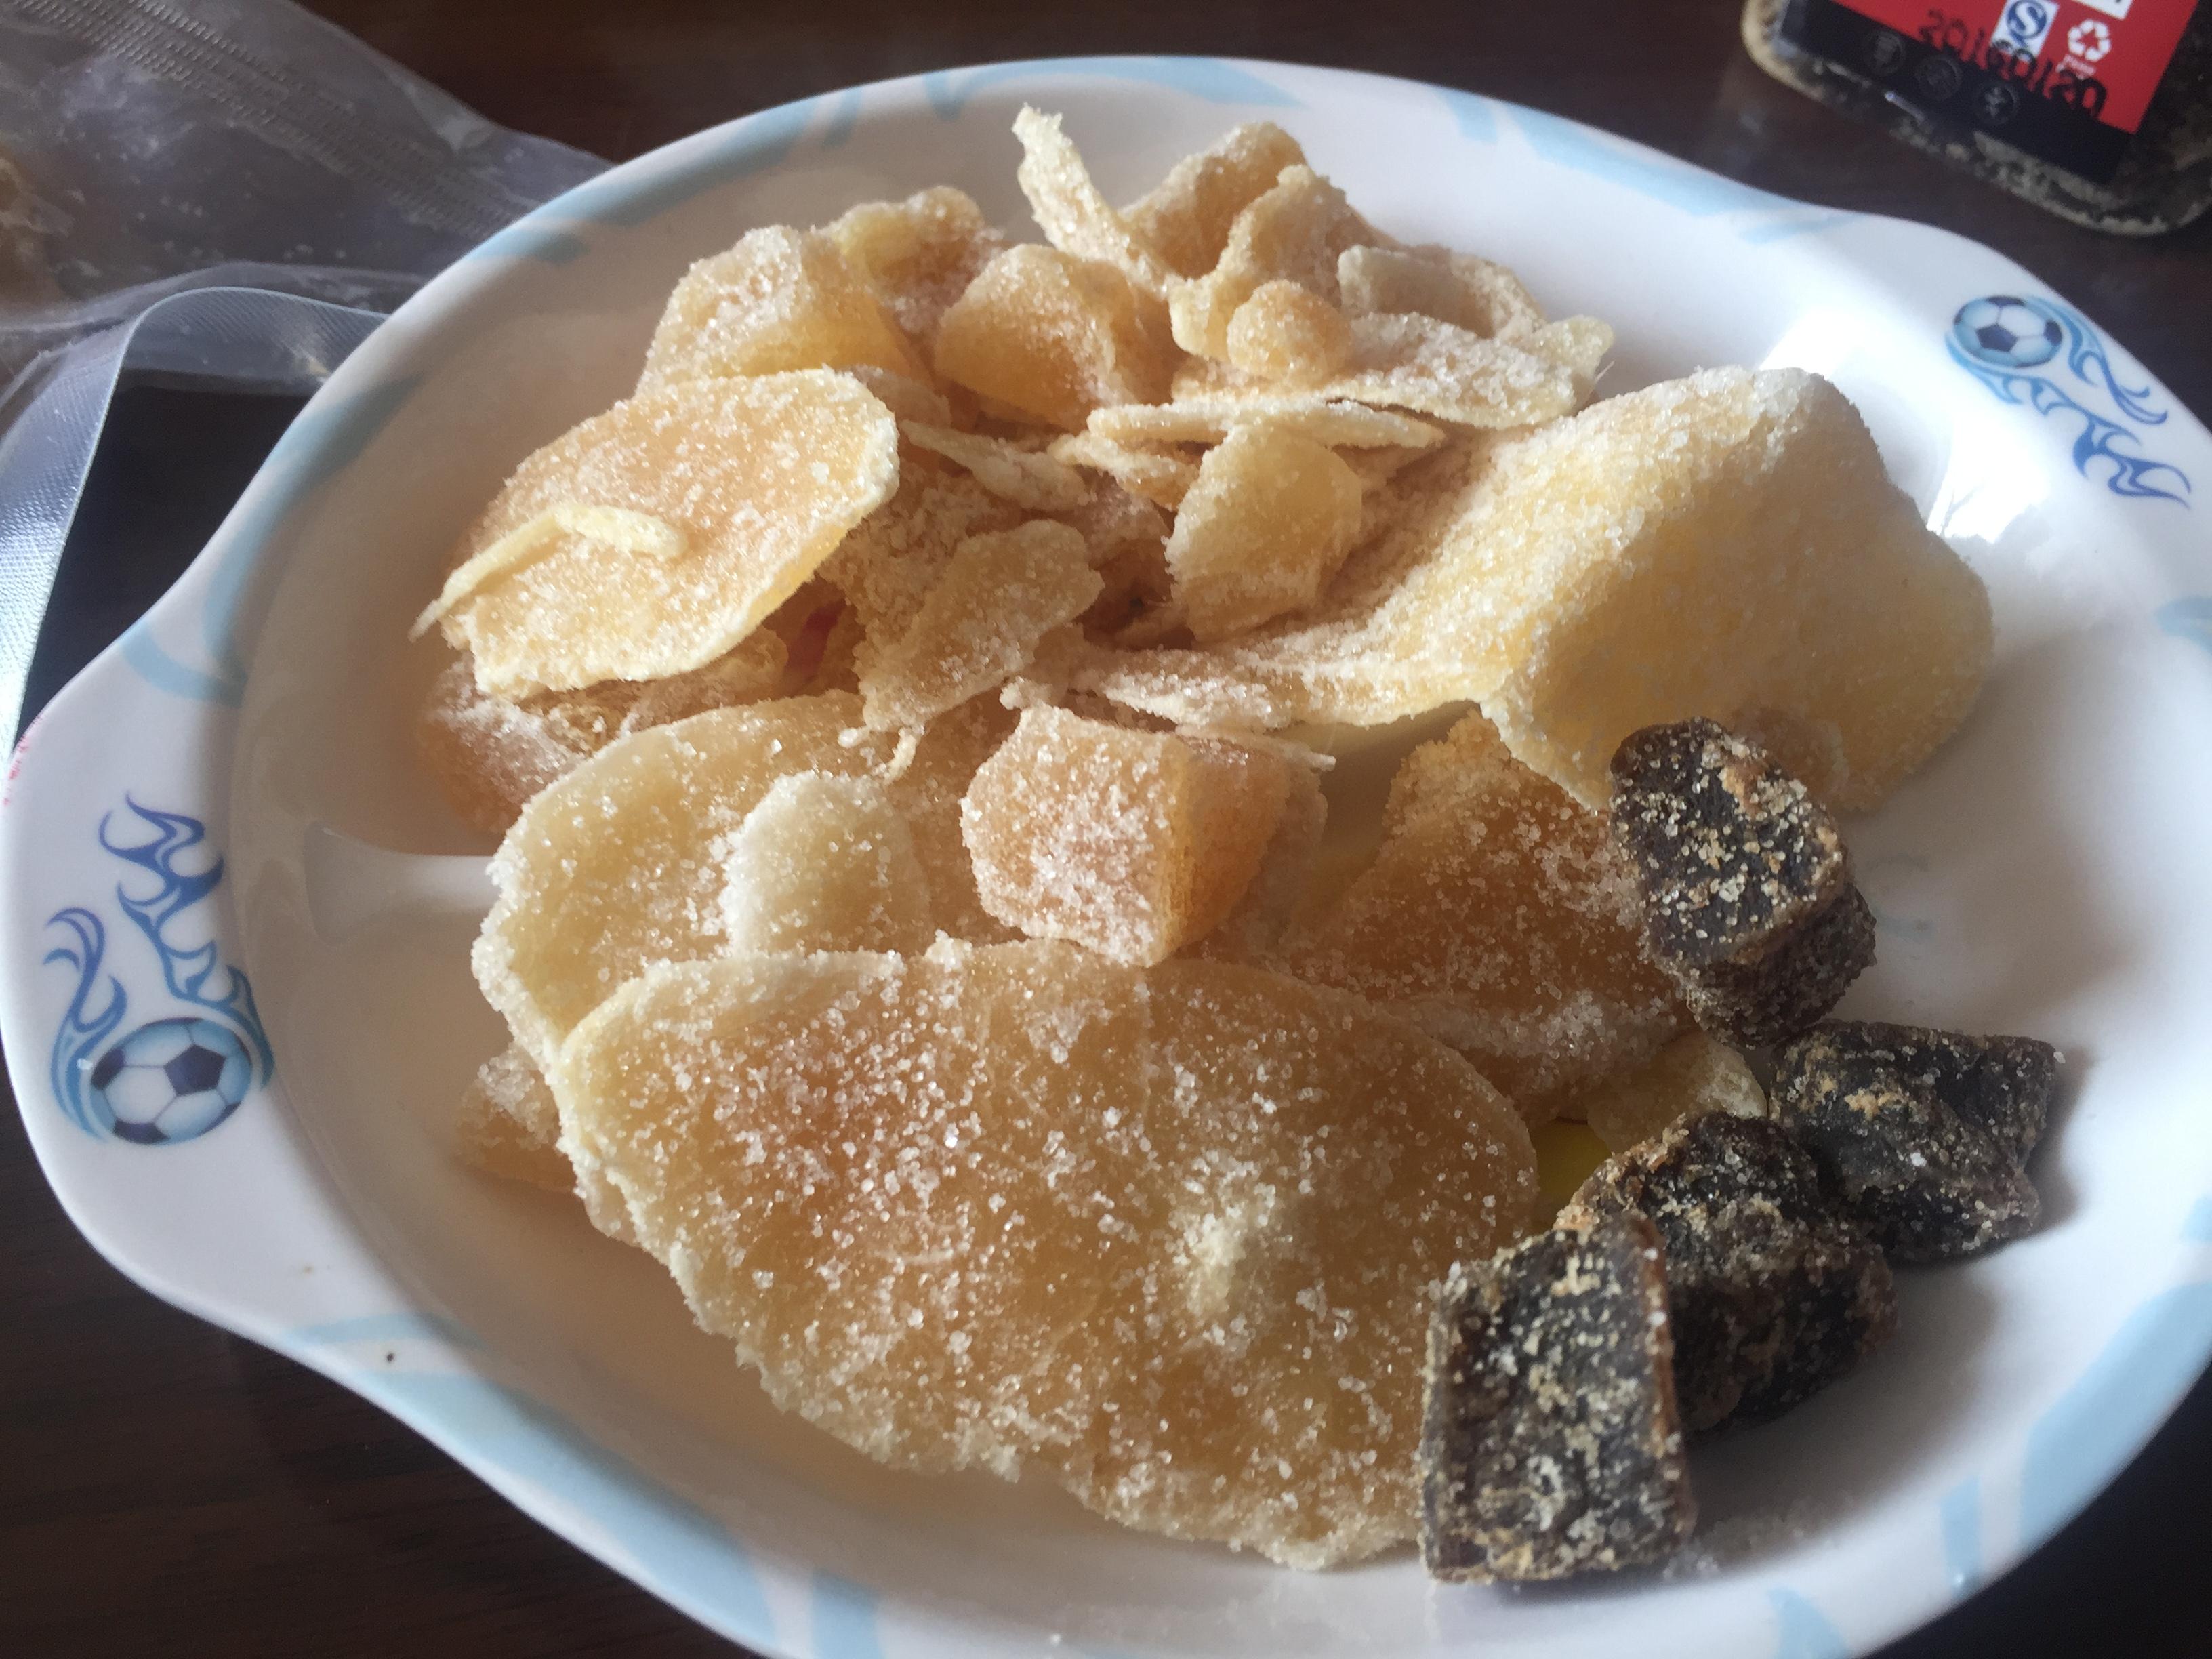 Crystallized ginger mix